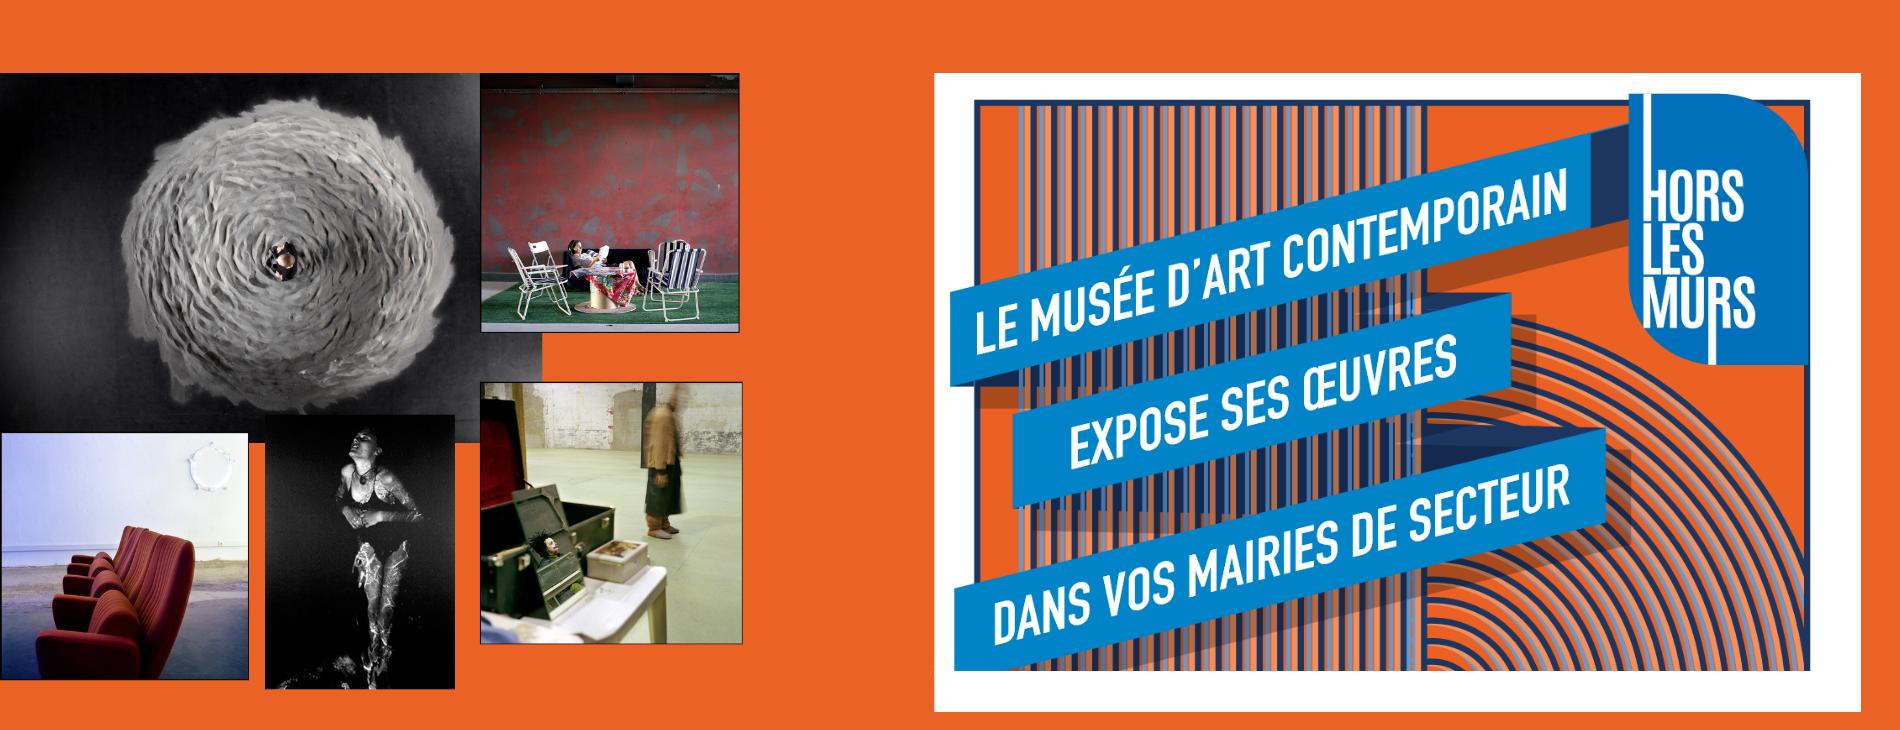 https://www.mairie-marseille2-3.com/wp-content/uploads/2021/09/ban-mac.png